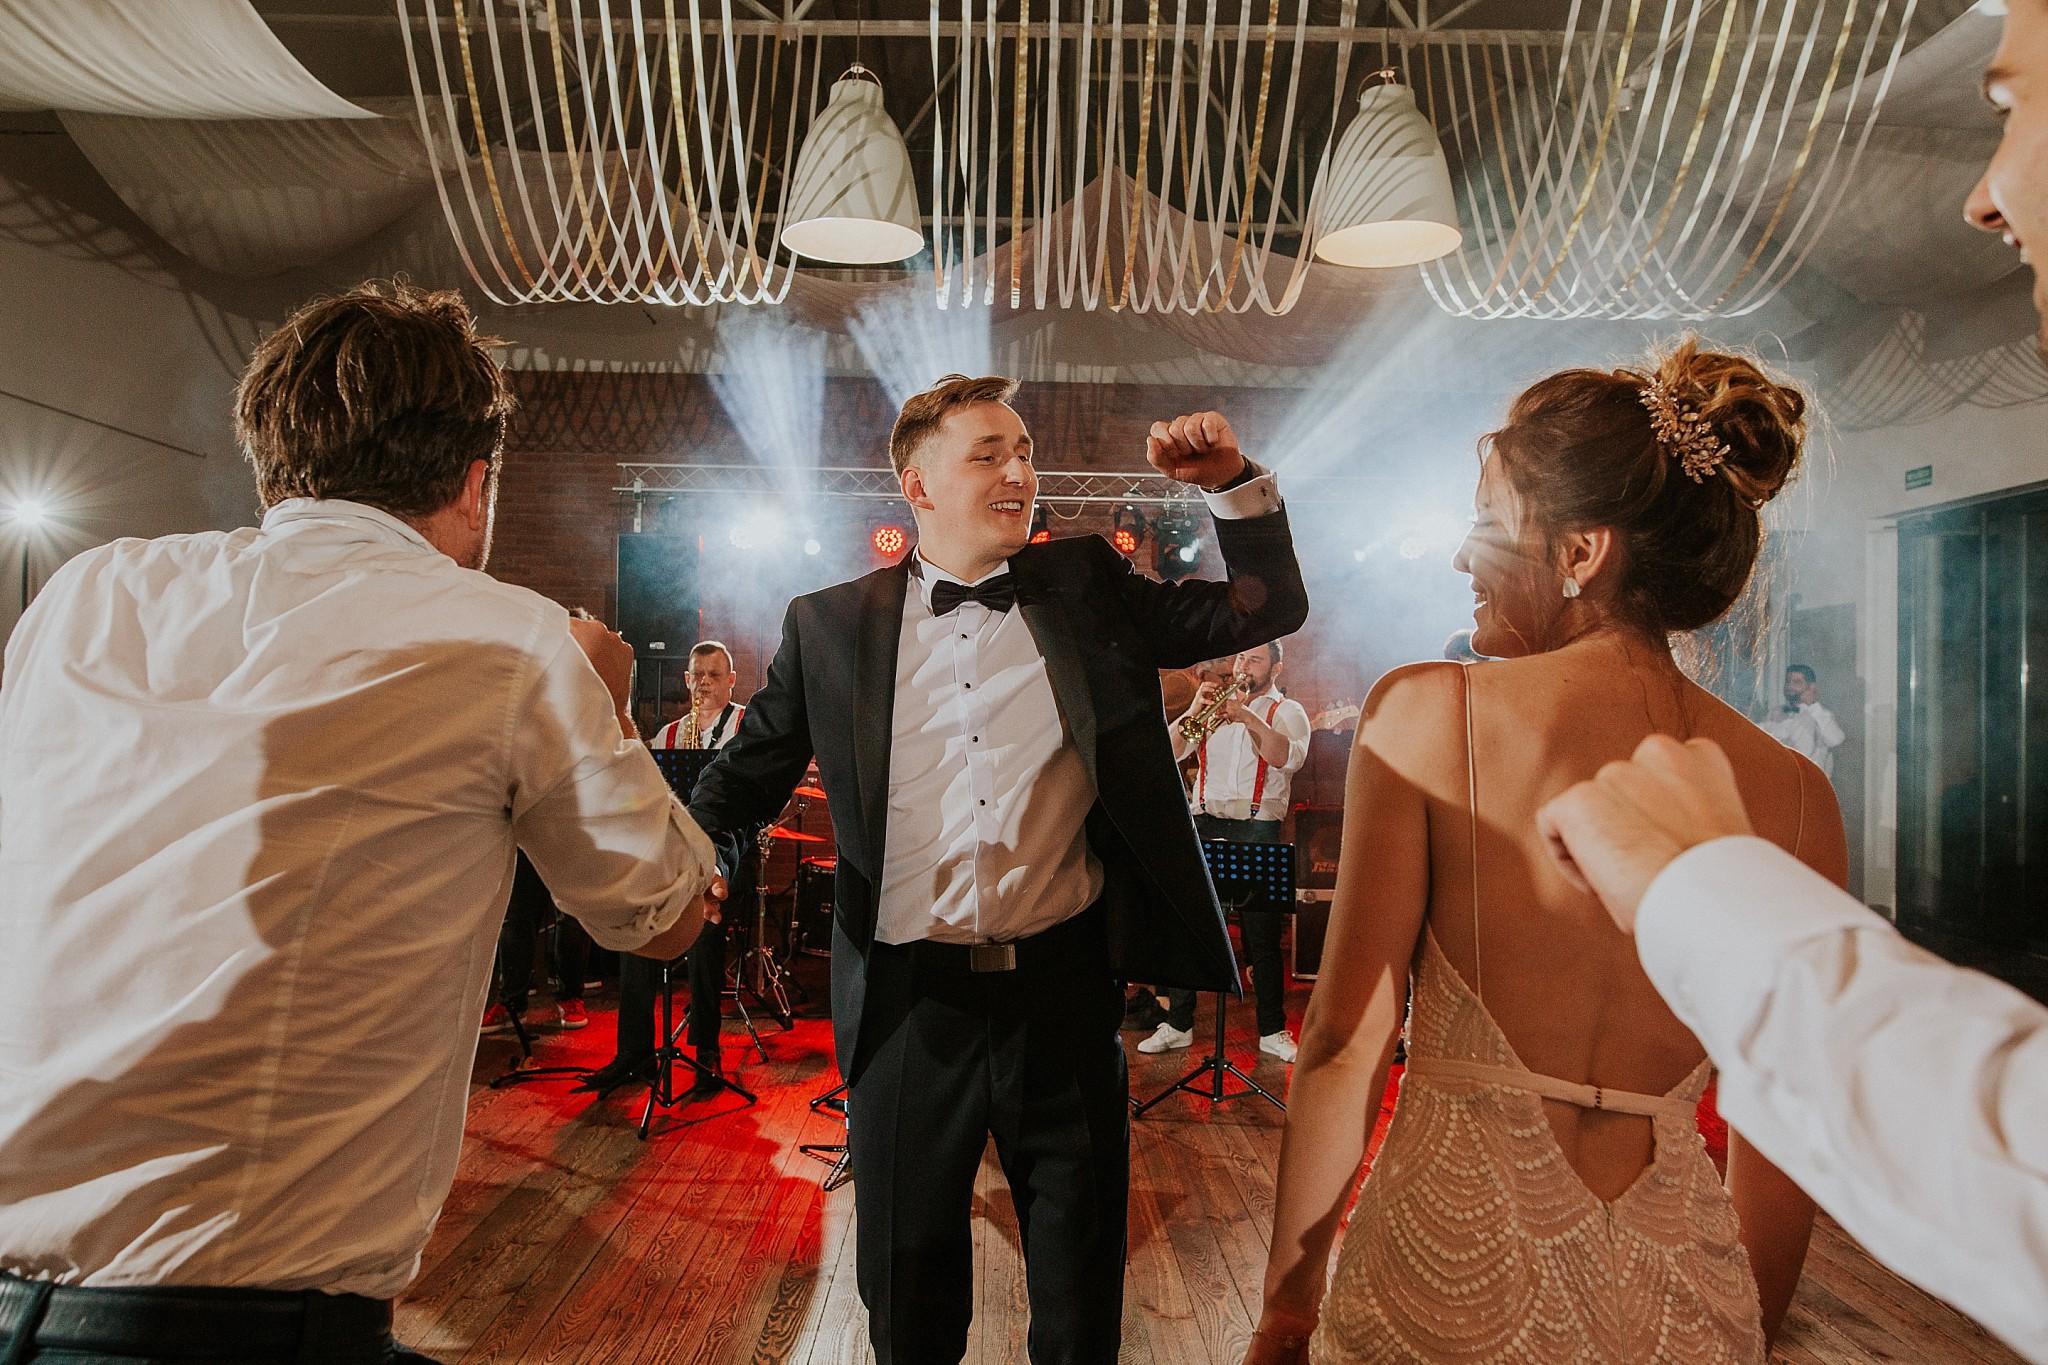 fotograf poznan wesele dobra truskawka piekne wesele pod poznaniem wesele w dobrej truskawce piekna para mloda slub marzen slub koronawirus slub listopad wesele koronawirus 454